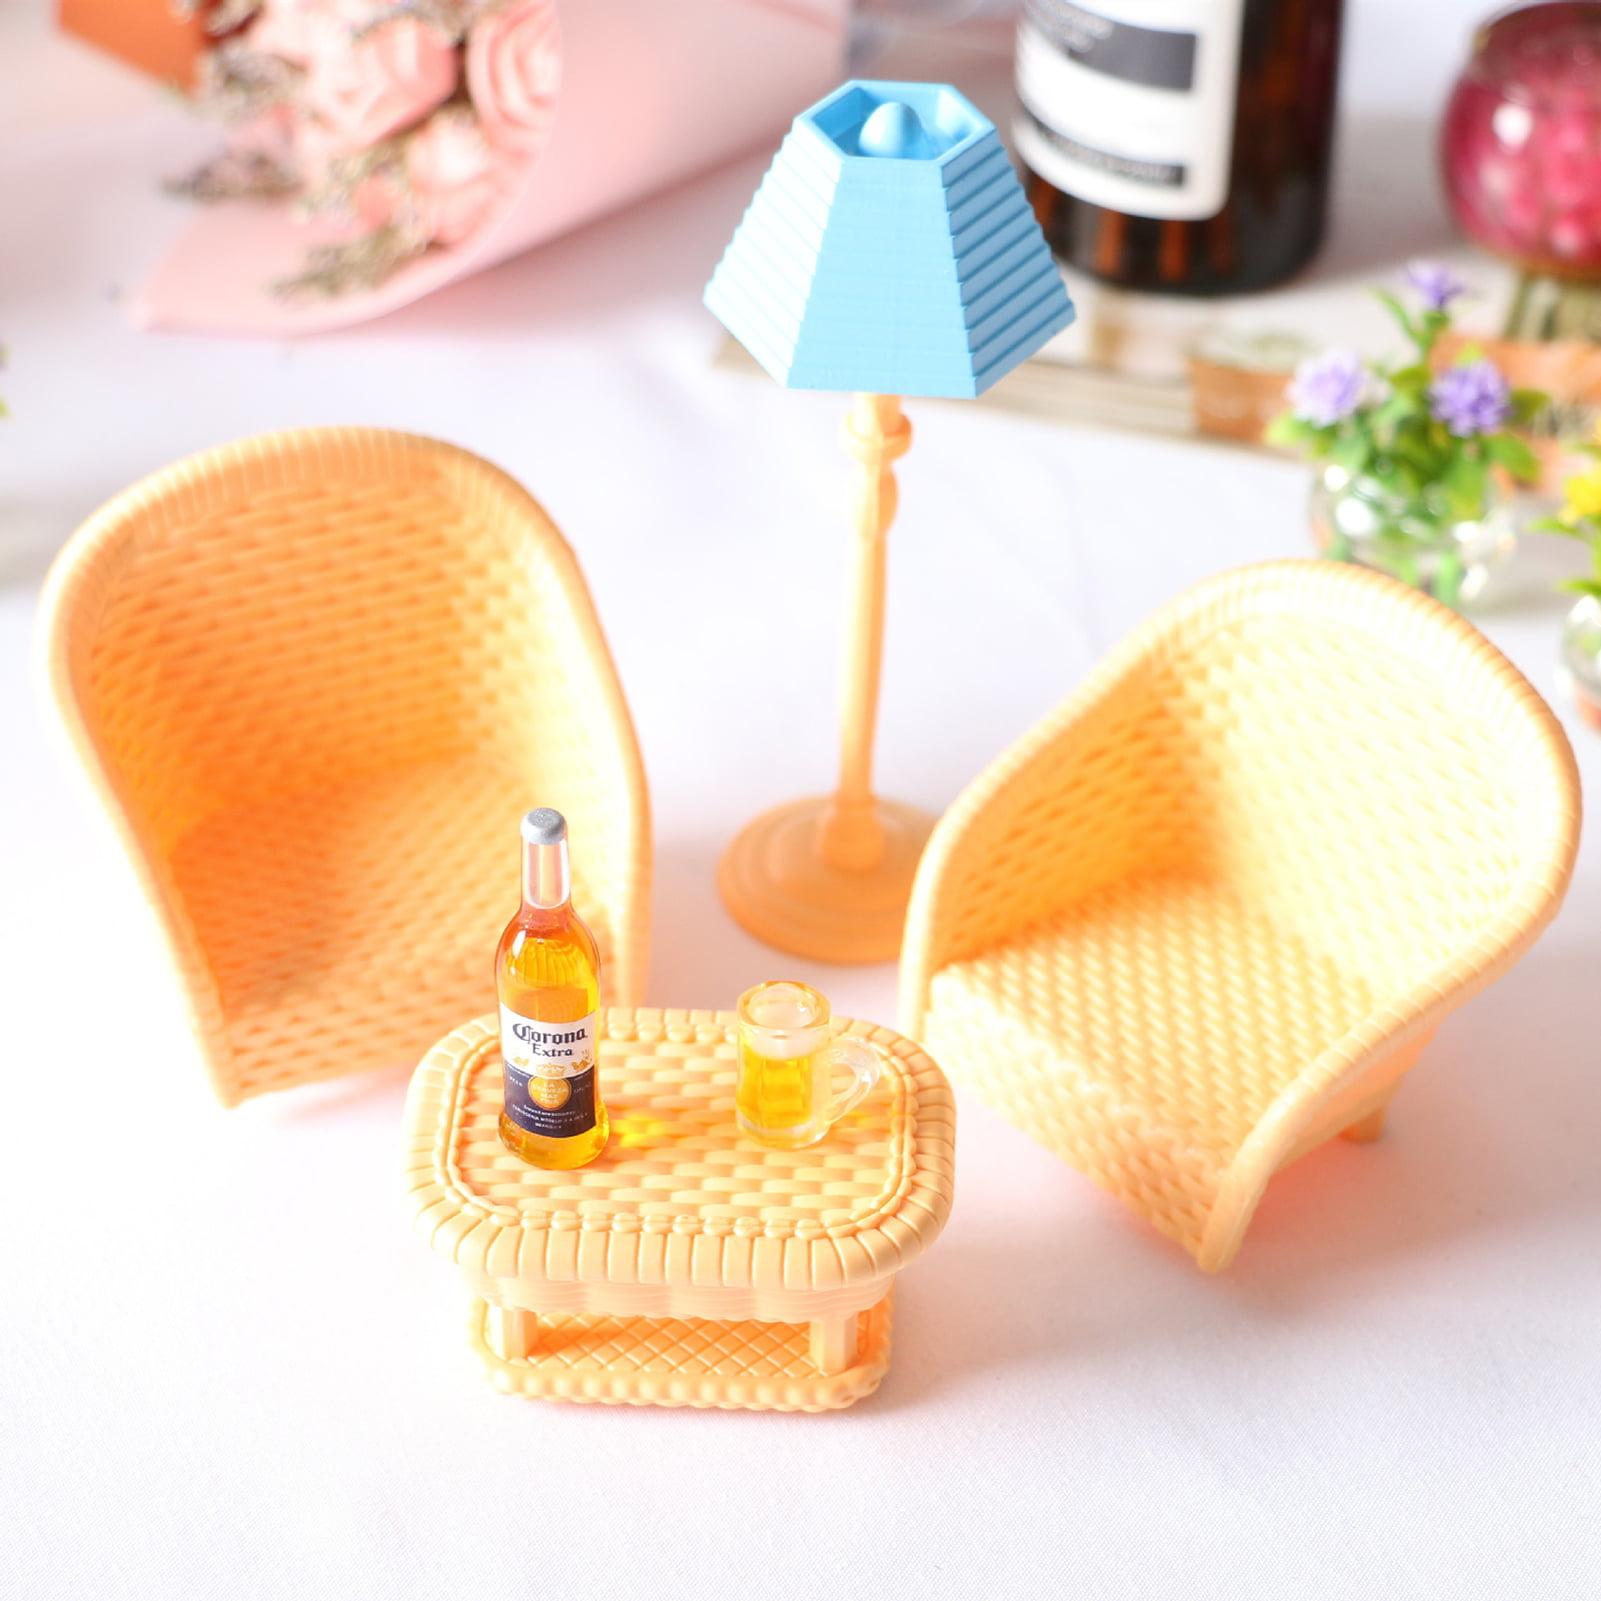 Lubelski Dollhouse Miniature Rattan Chair Tea Table Light Beer Mug Living Room Decoration Walmart Canada